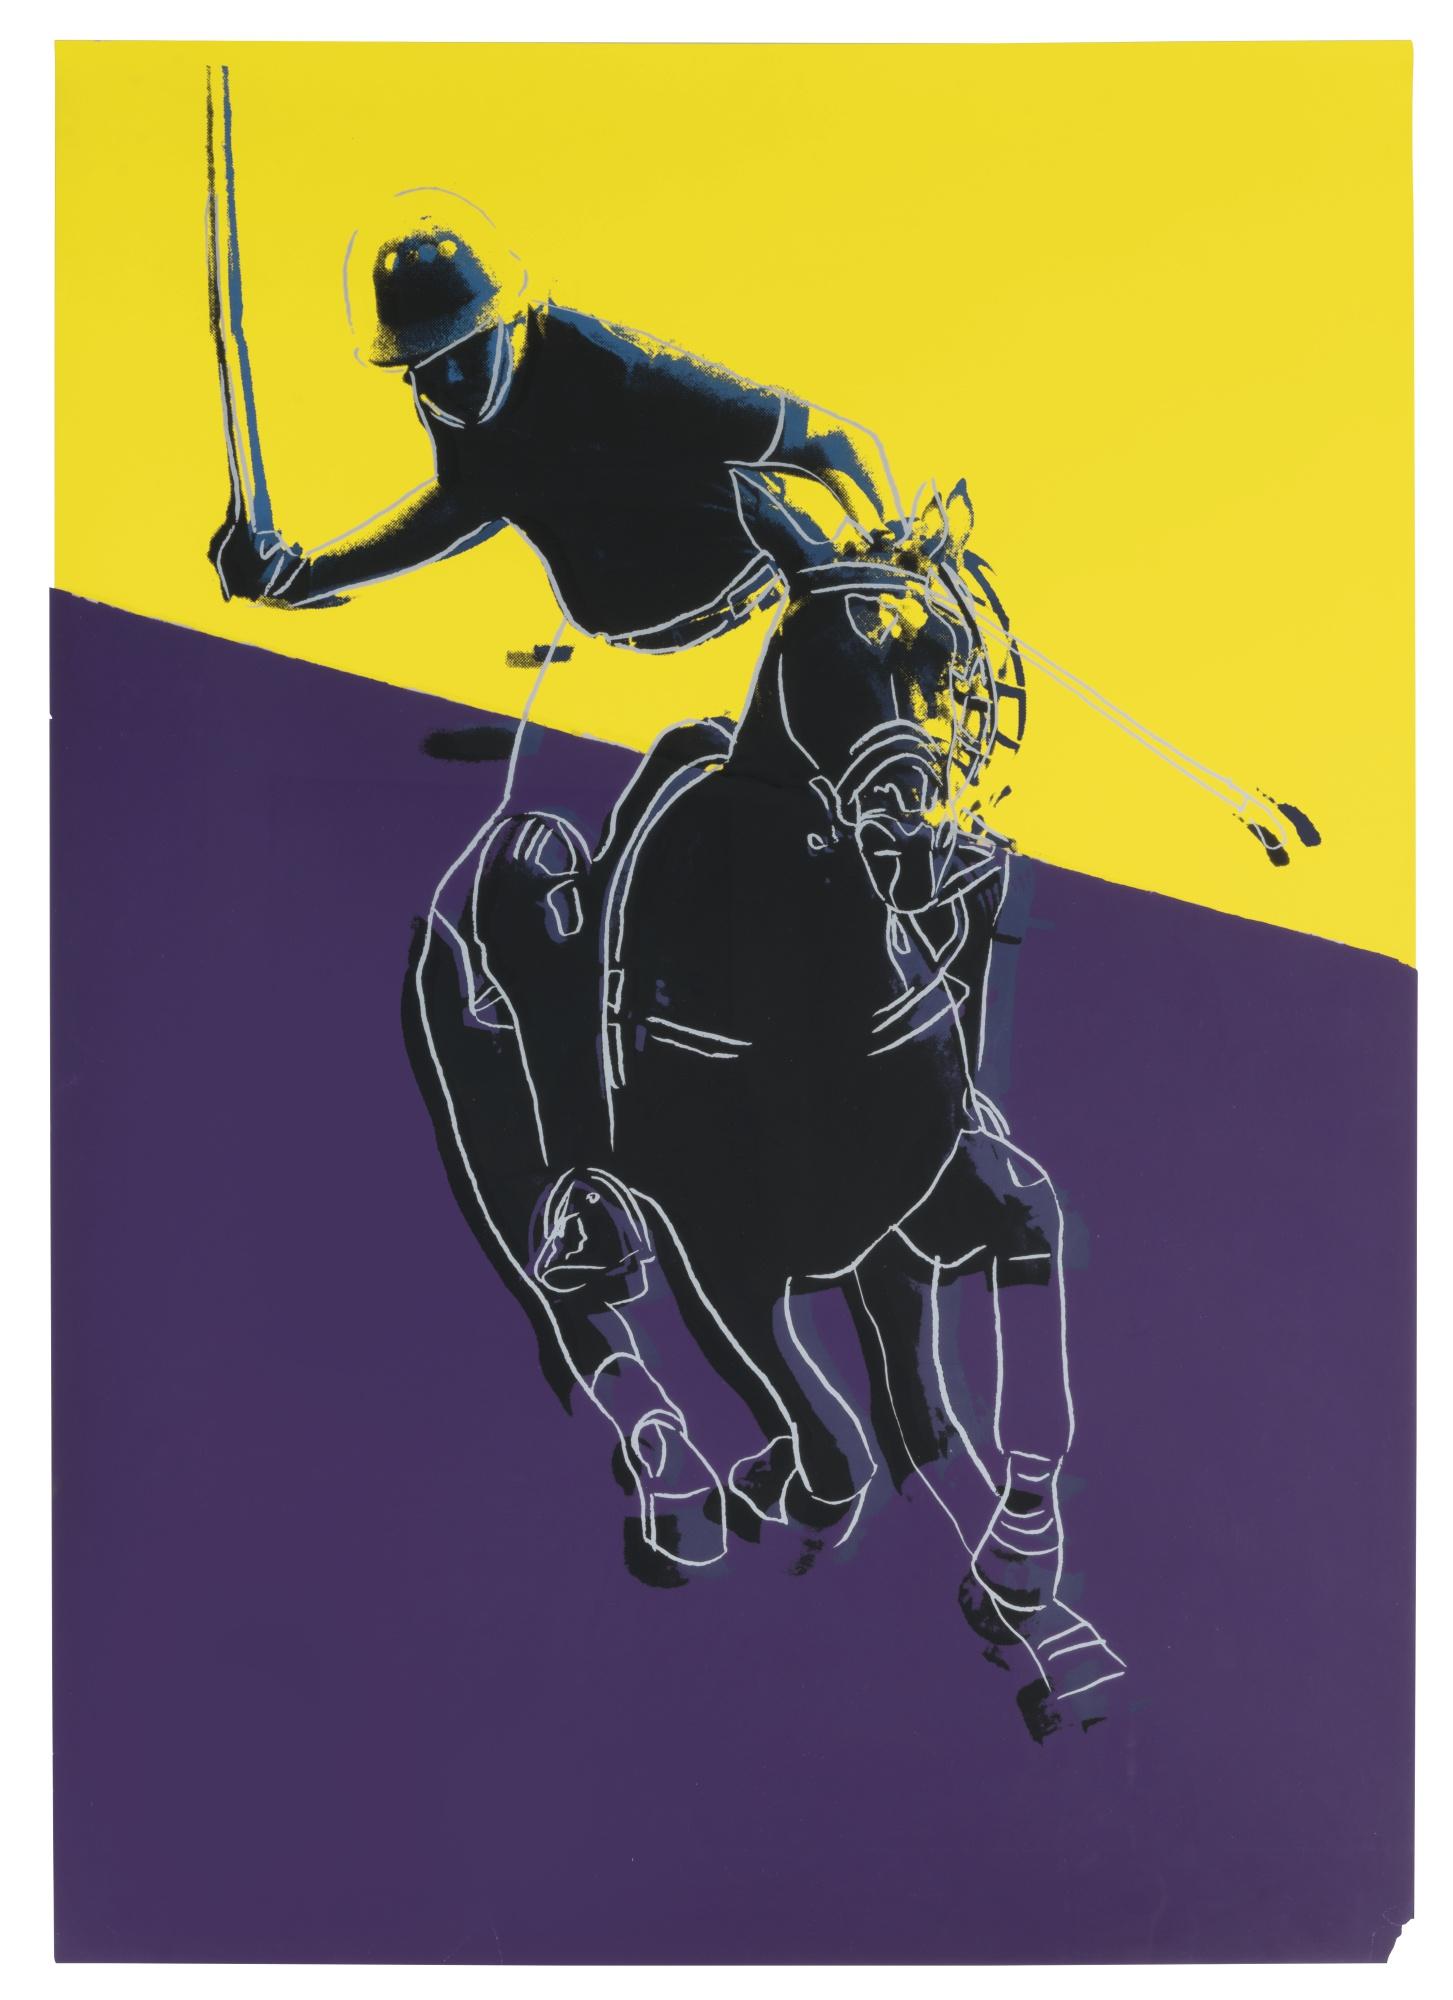 Andy Warhol-Polo-1985